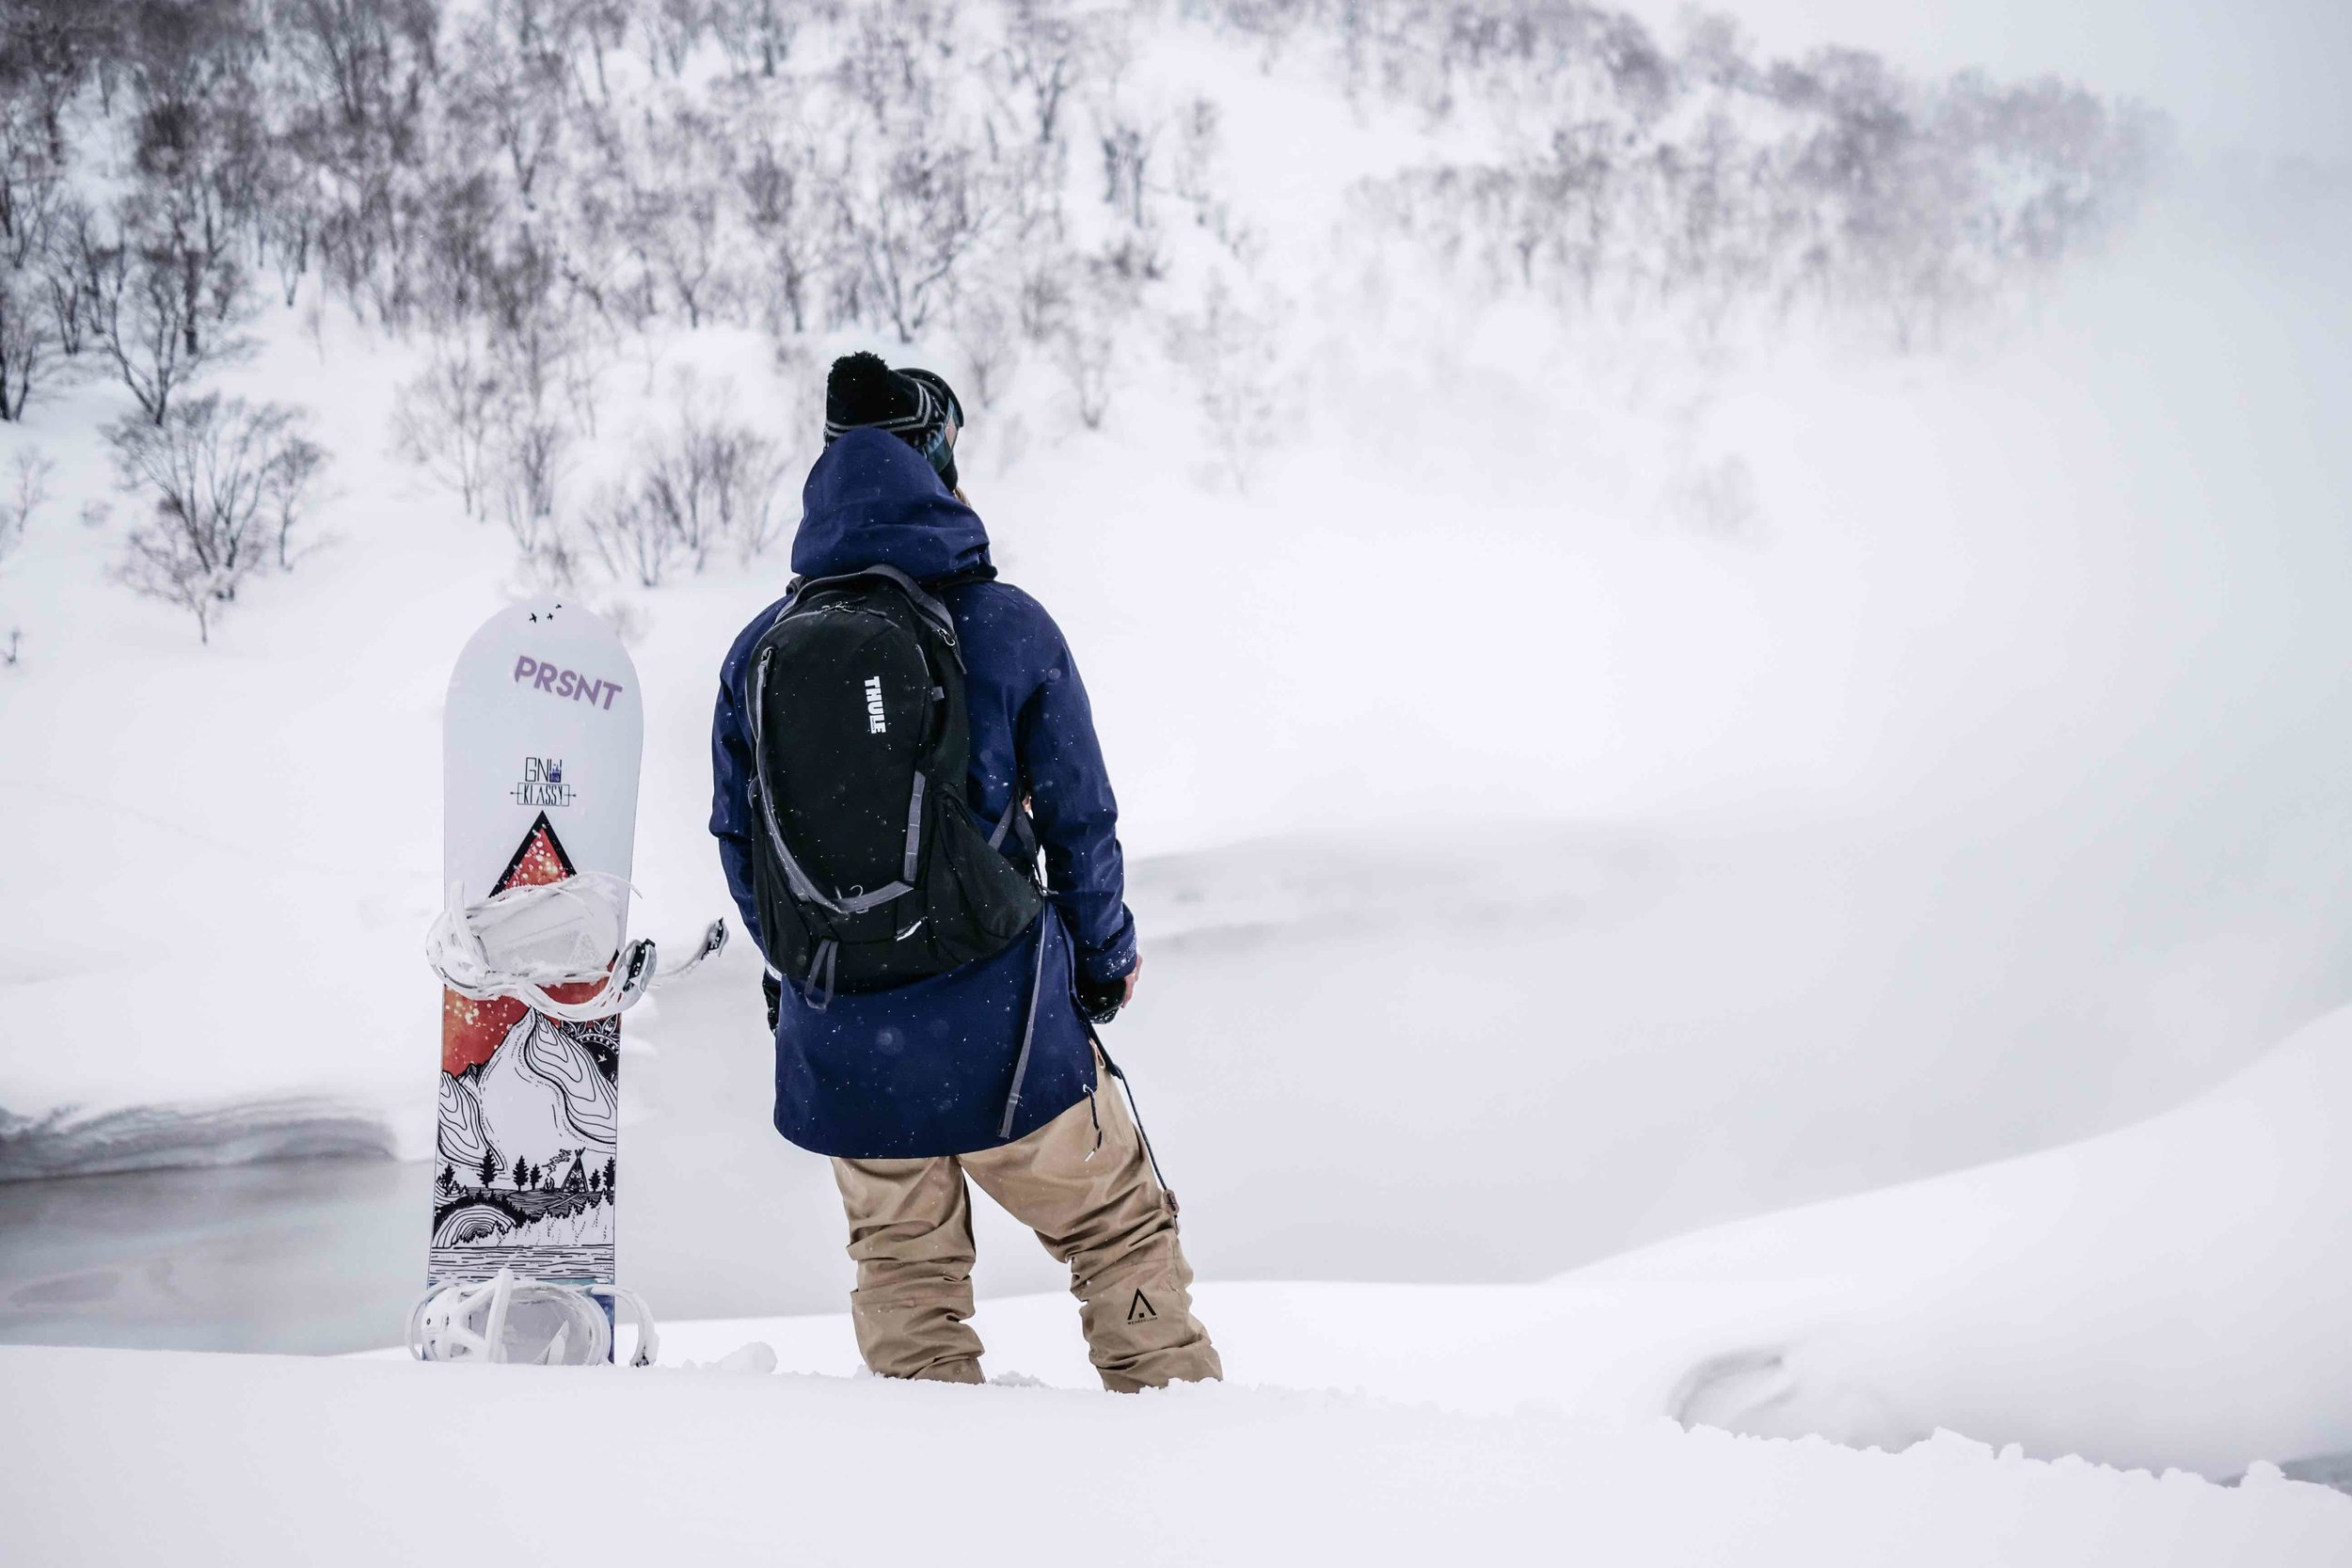 KJERSTI BUAAS BPRSNT ONSEN JAPAN NISEKO SNOWBOARDING.jpg